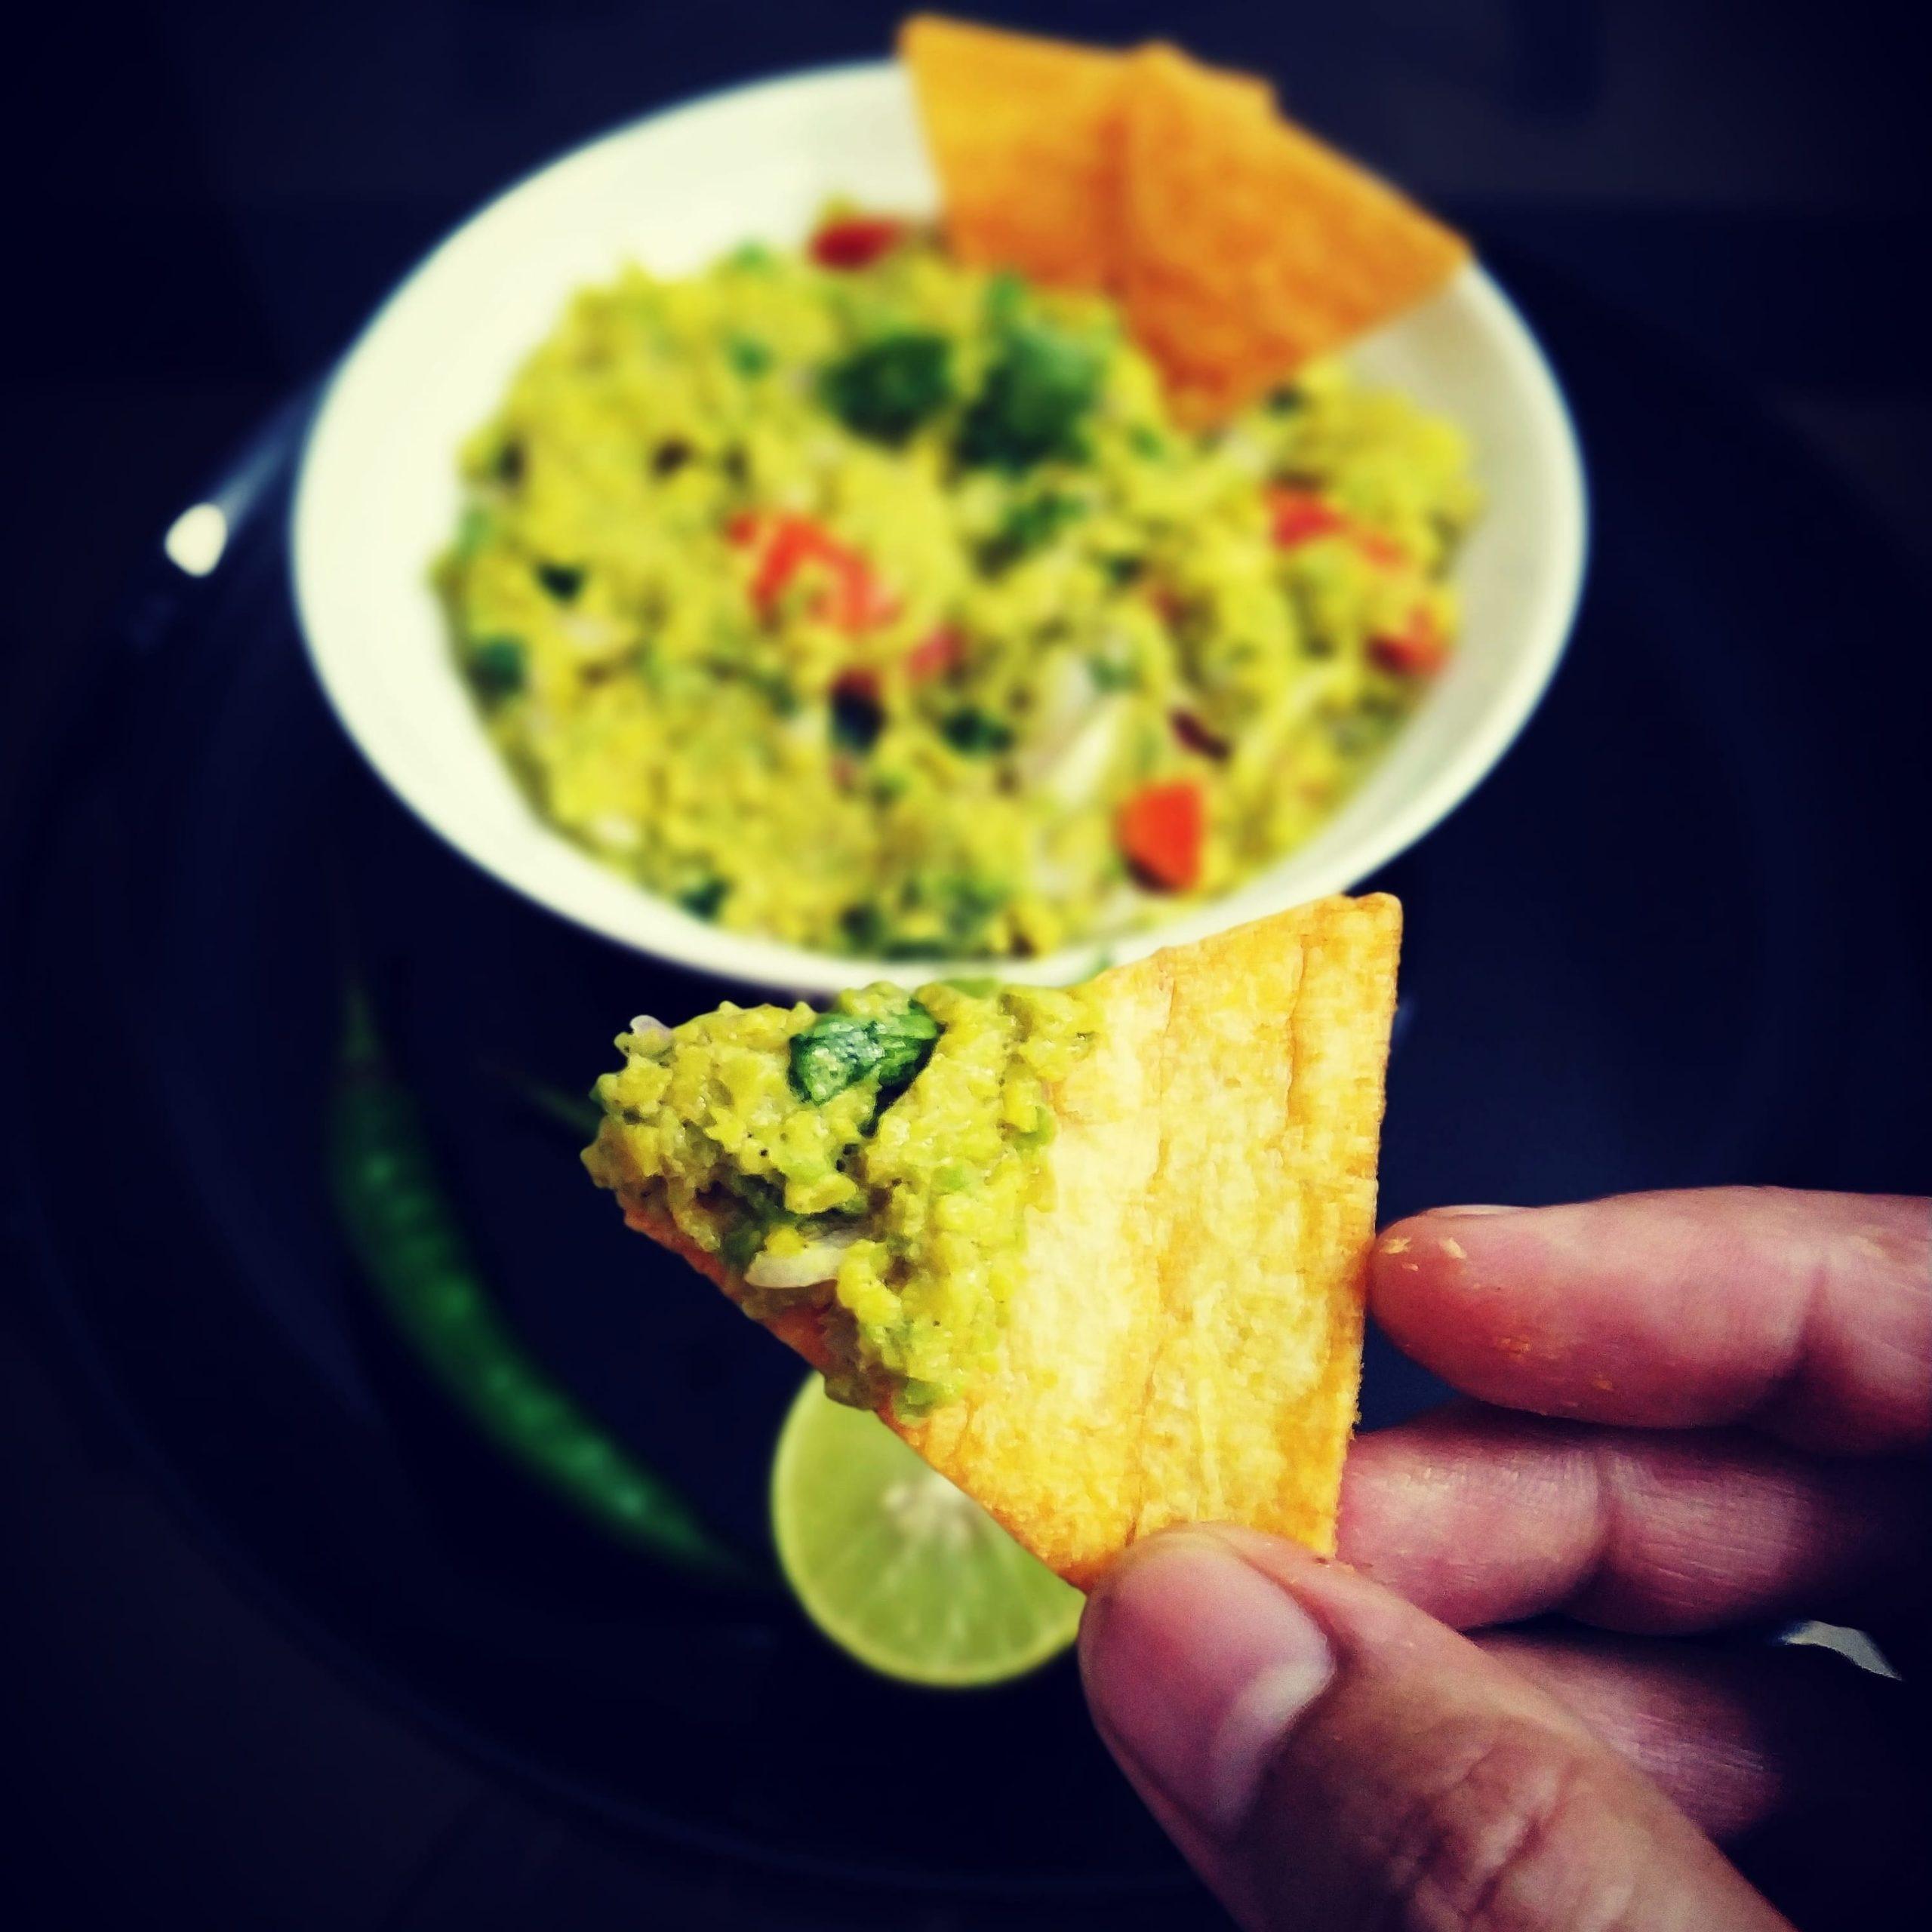 A Mexican dish made of Avocado